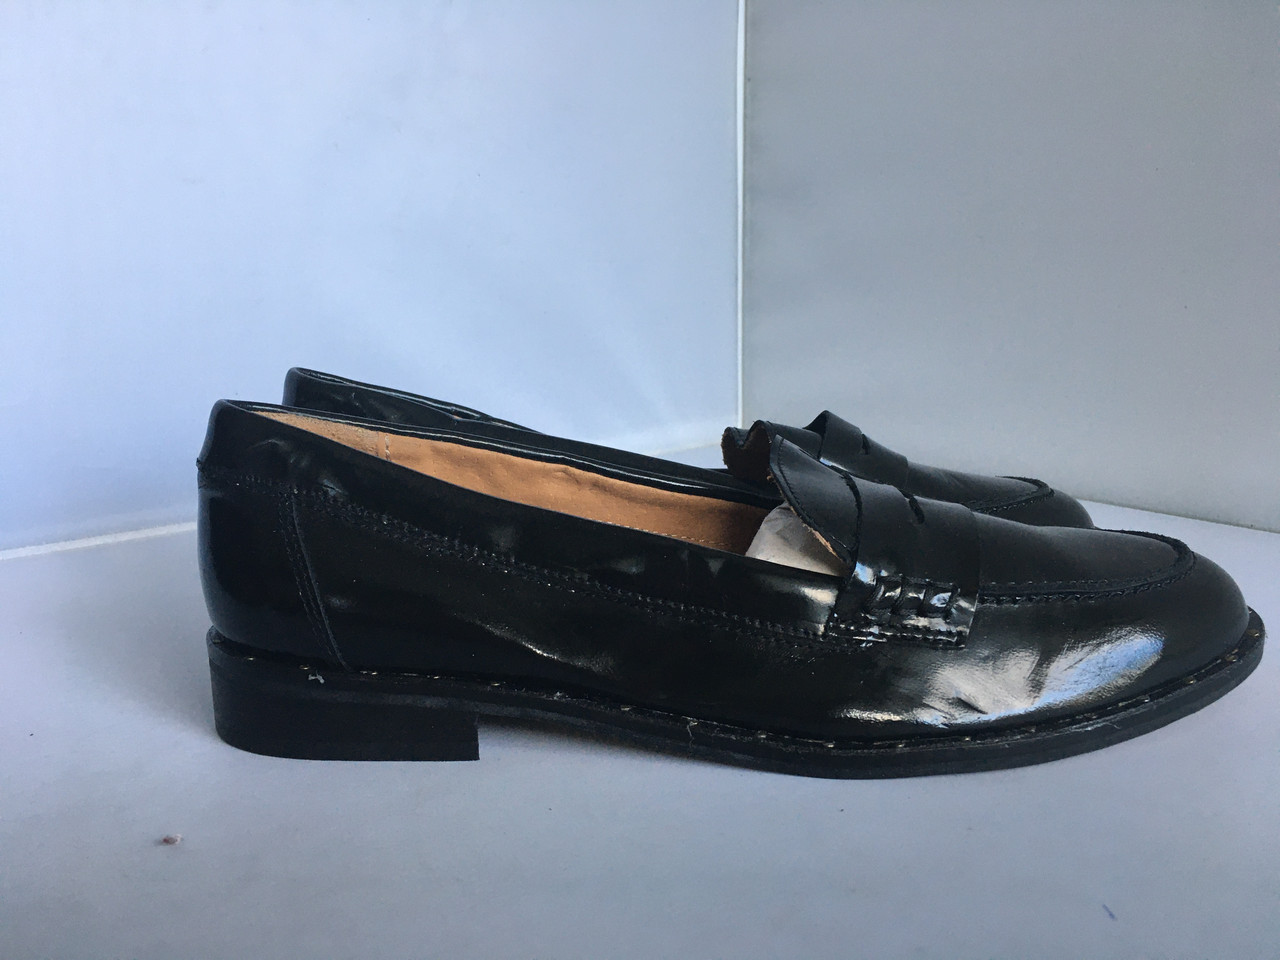 Женские туфли- лоферы Andre, 38, 39 размер